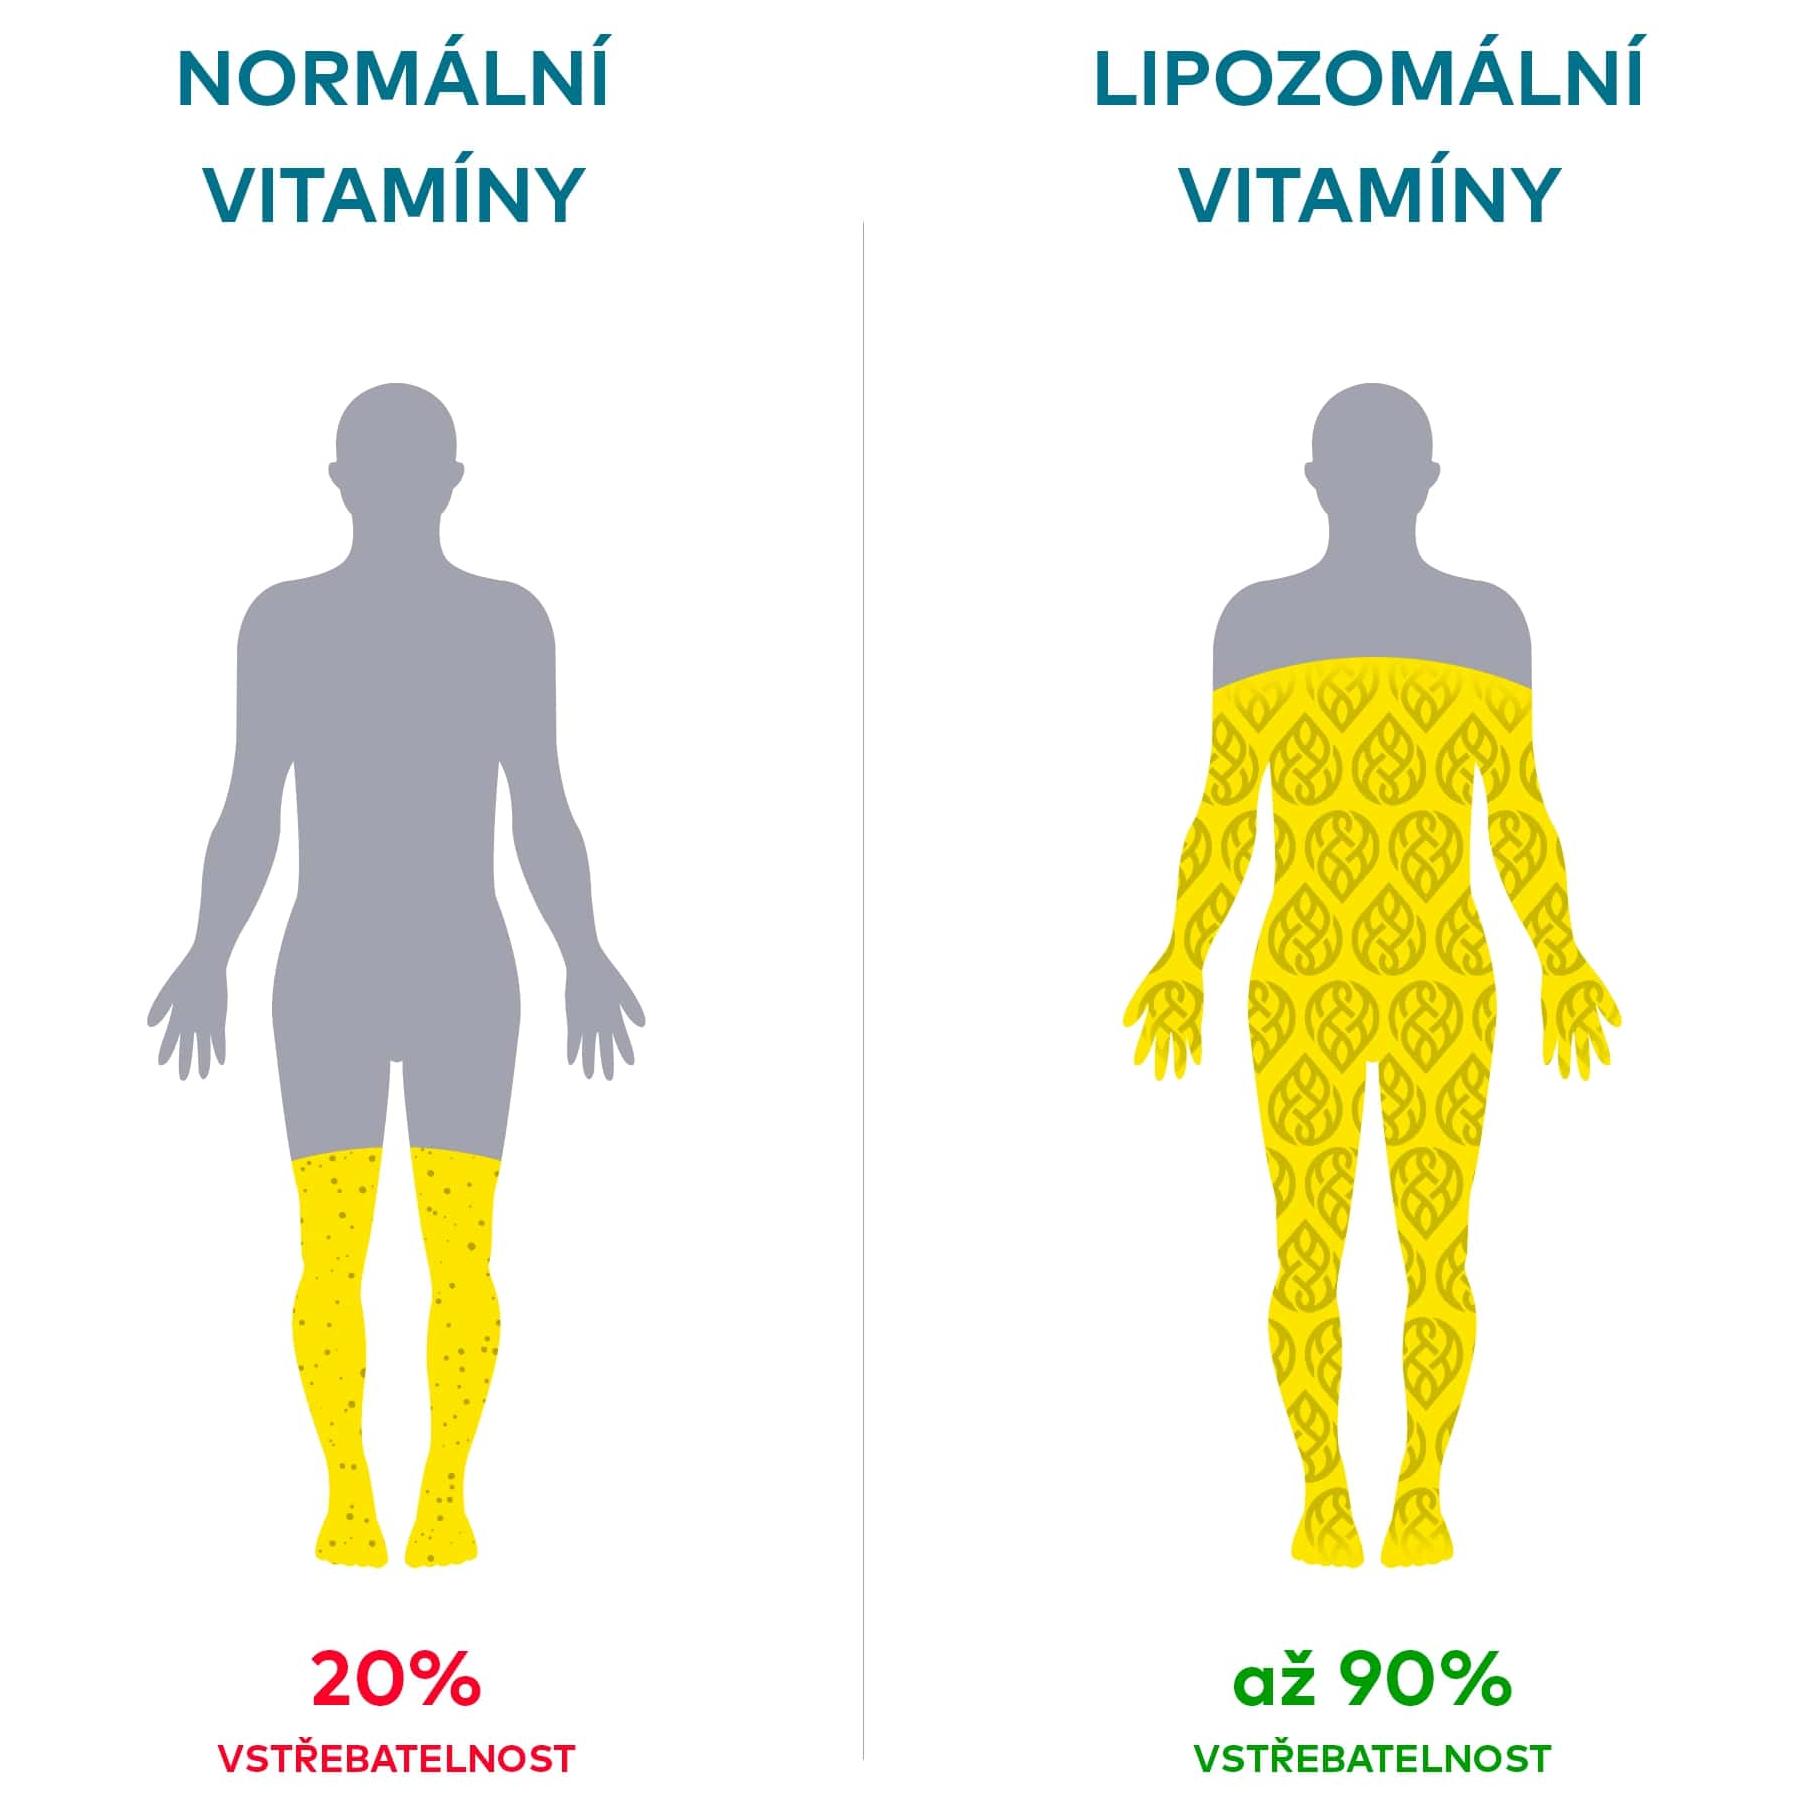 jpg-infografika-vstřebatelnost-lipozomalnich-vitaminu